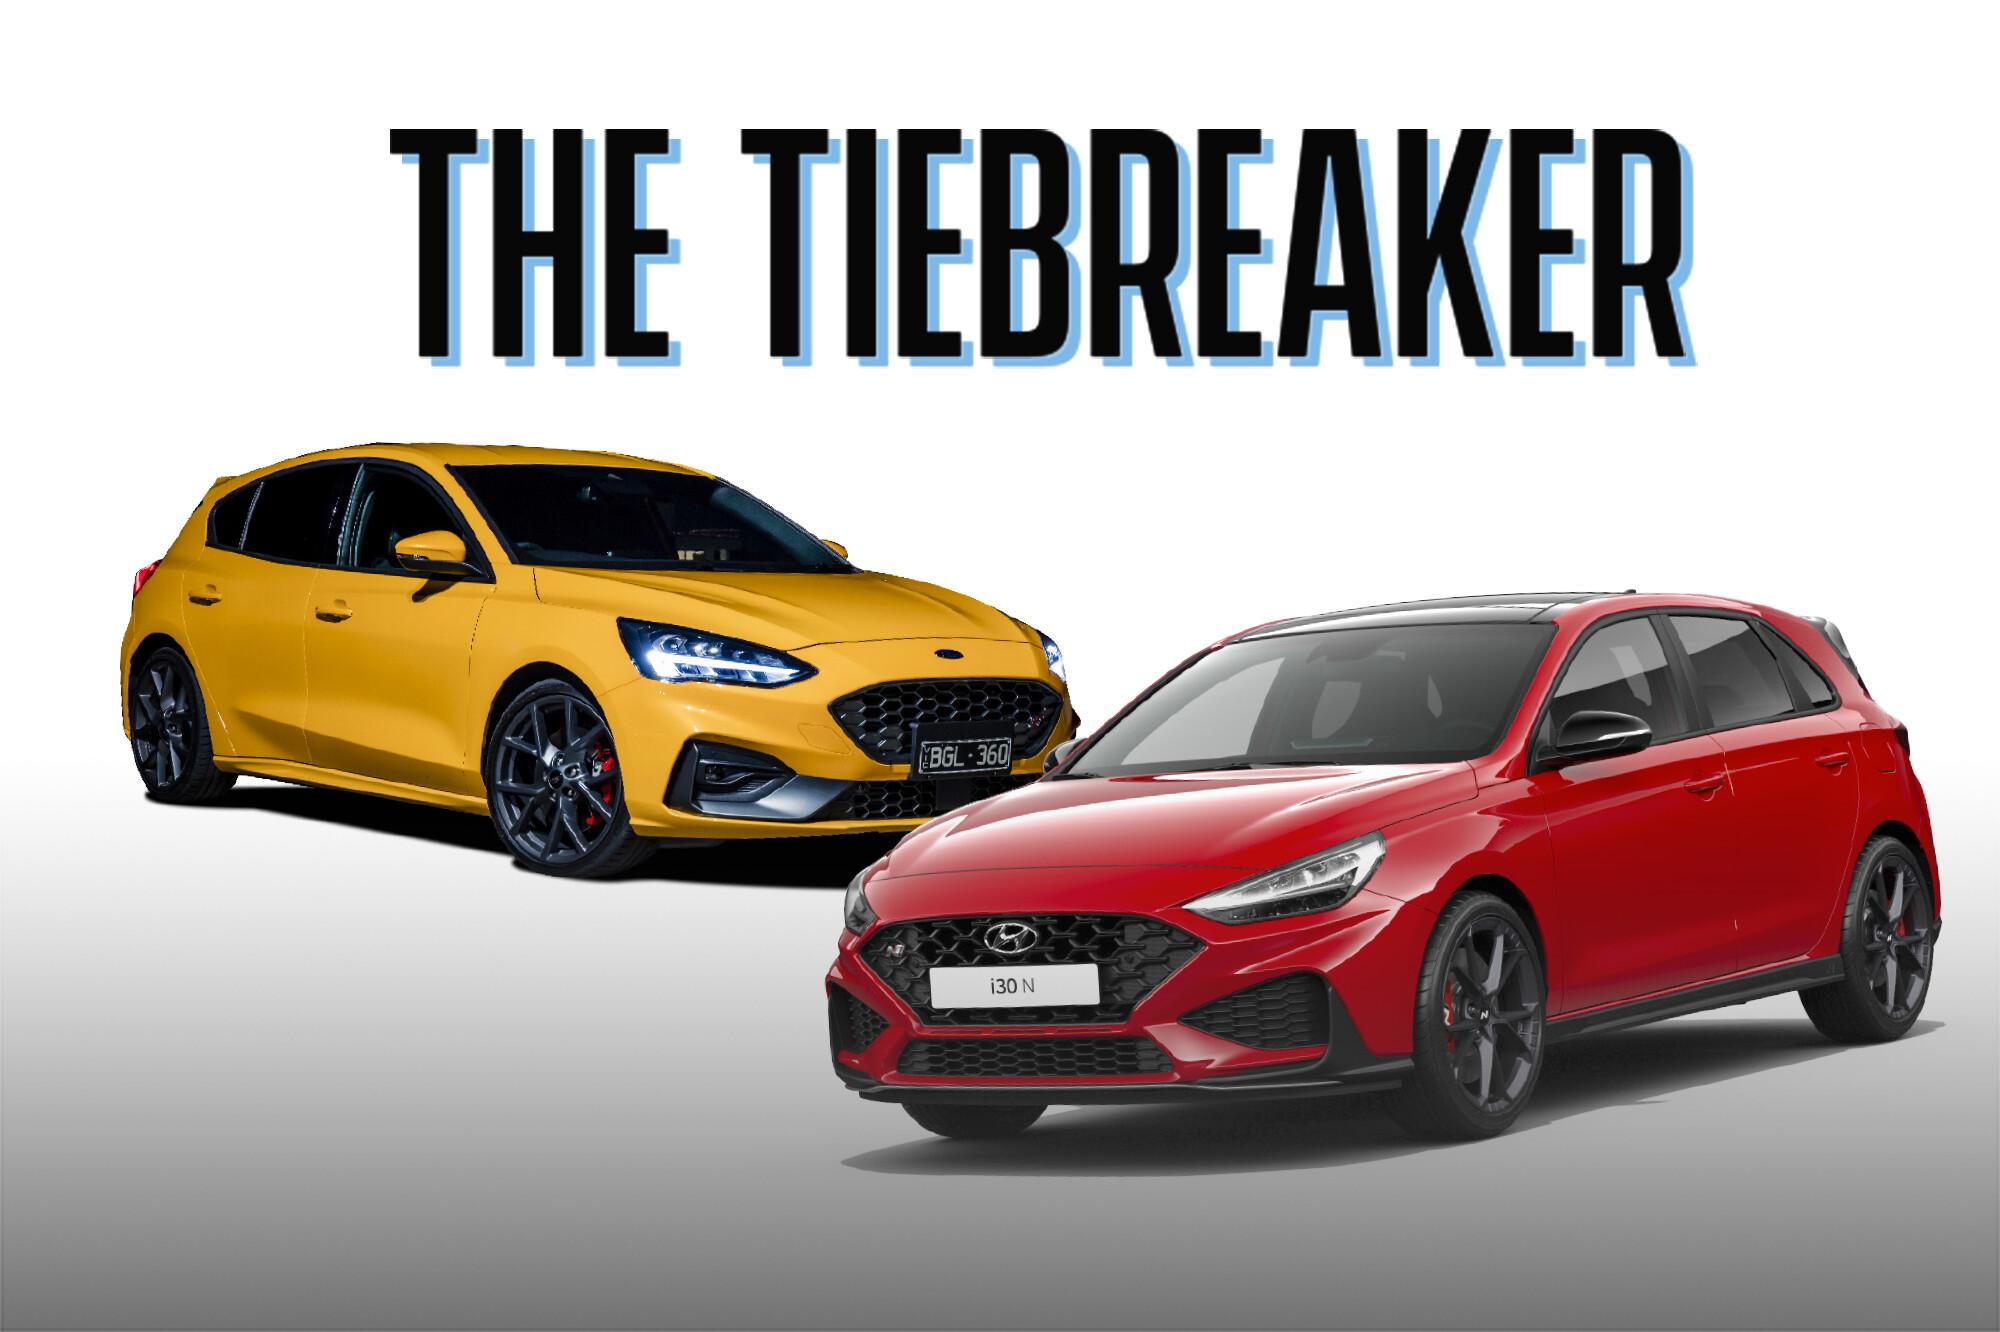 Tiebreaker: Ford Focus ST v Hyundai i30 N